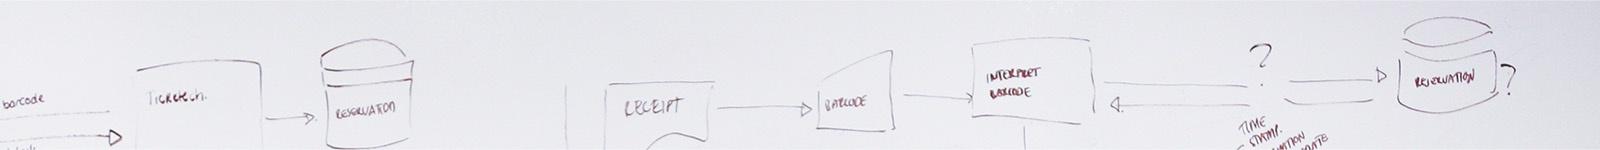 process-banner.jpg